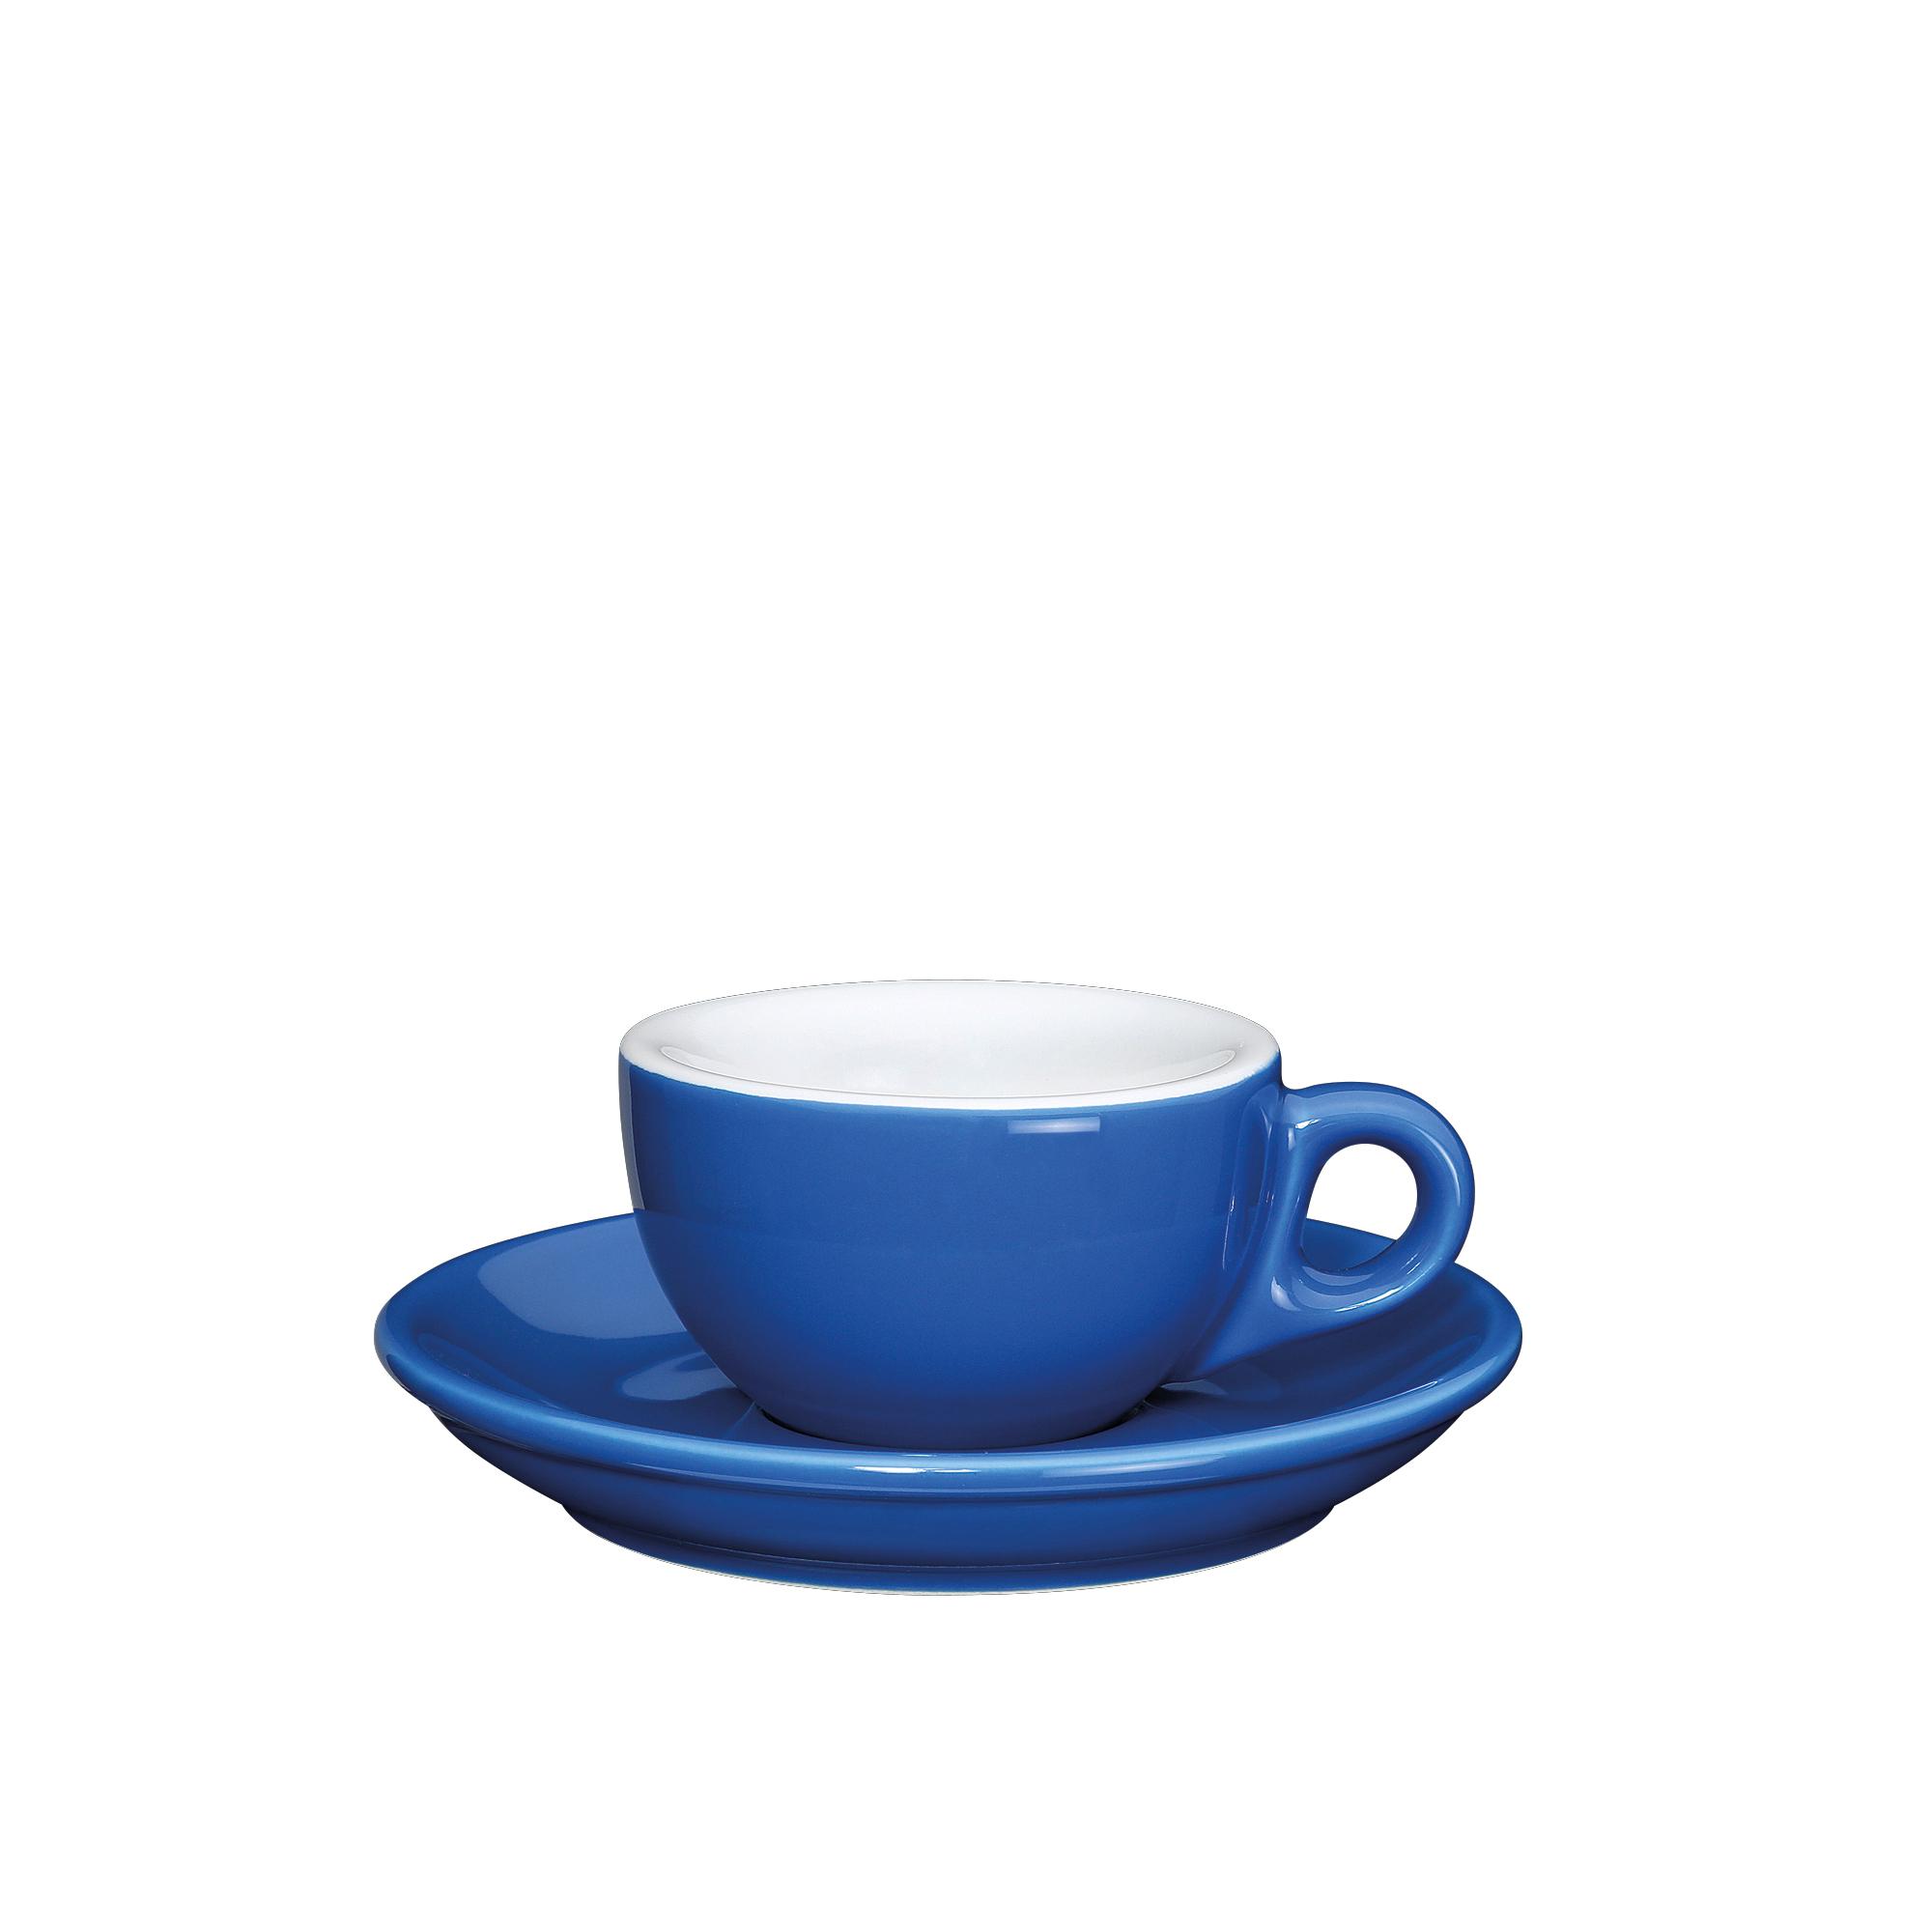 Cilio Roma Dark Blue Porcelain 1.7 Ounce Espresso Cup & Saucer